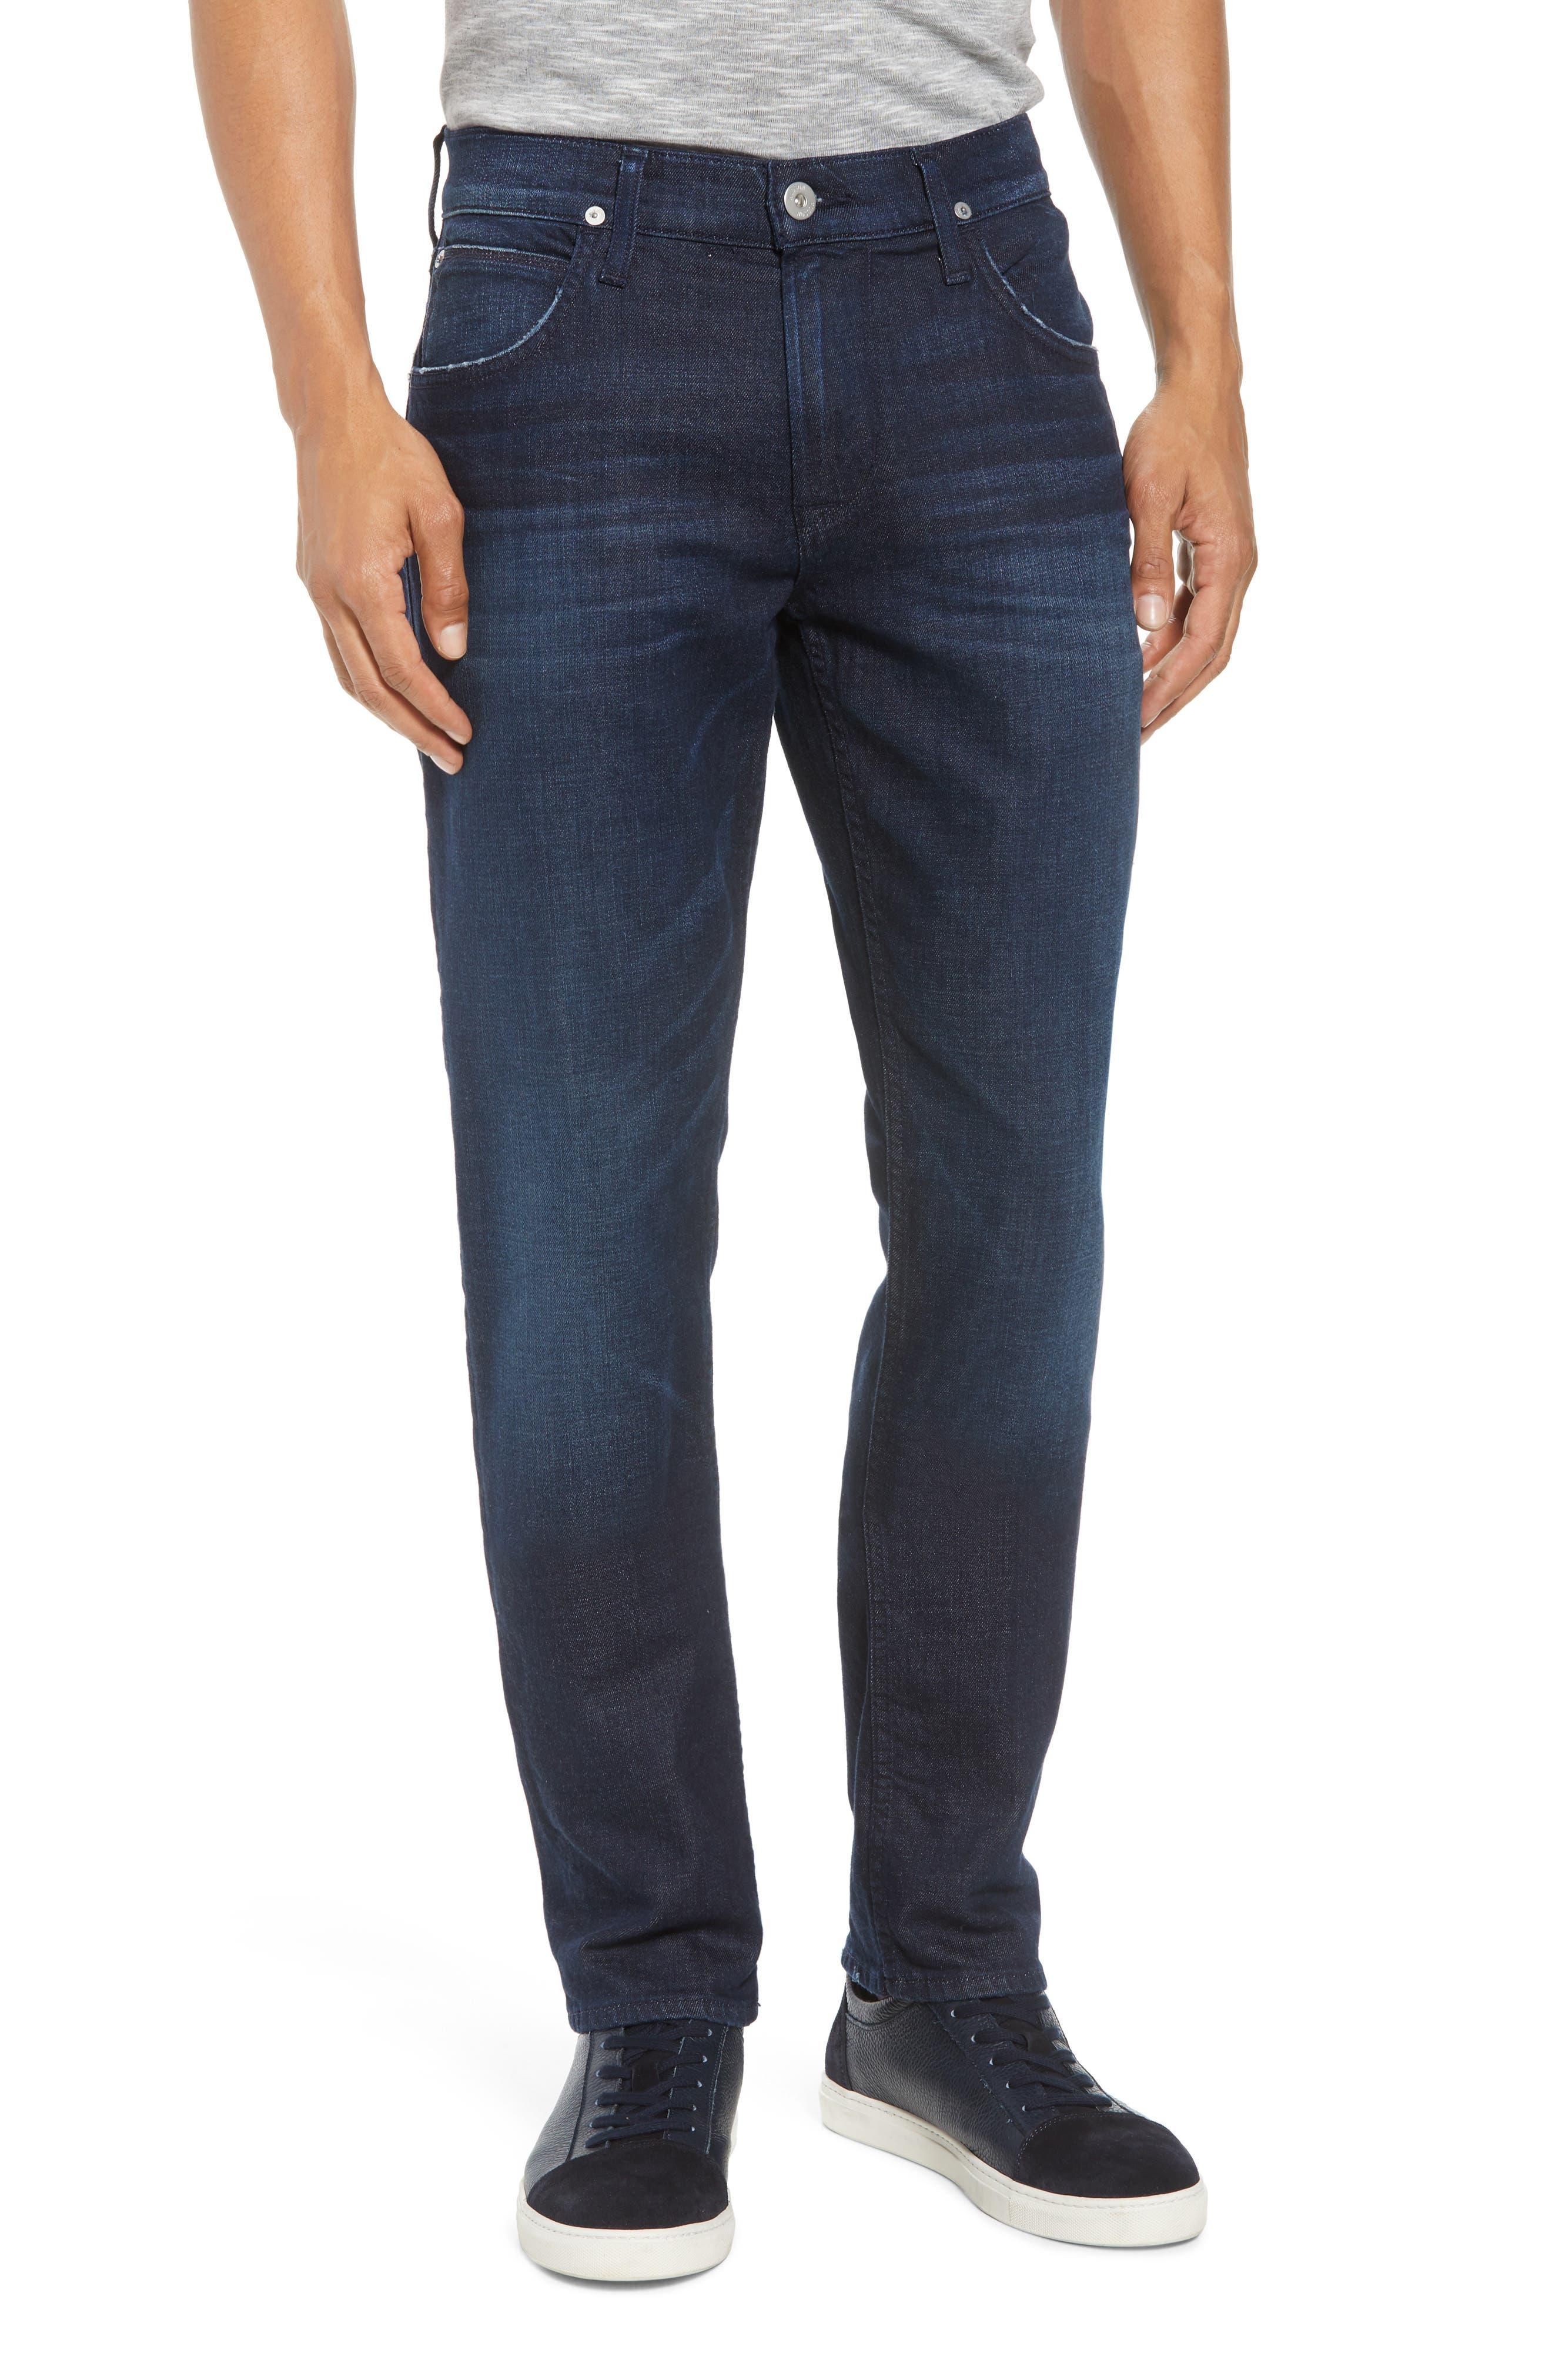 Blake Slim Fit Jeans,                             Main thumbnail 1, color,                             BARRY